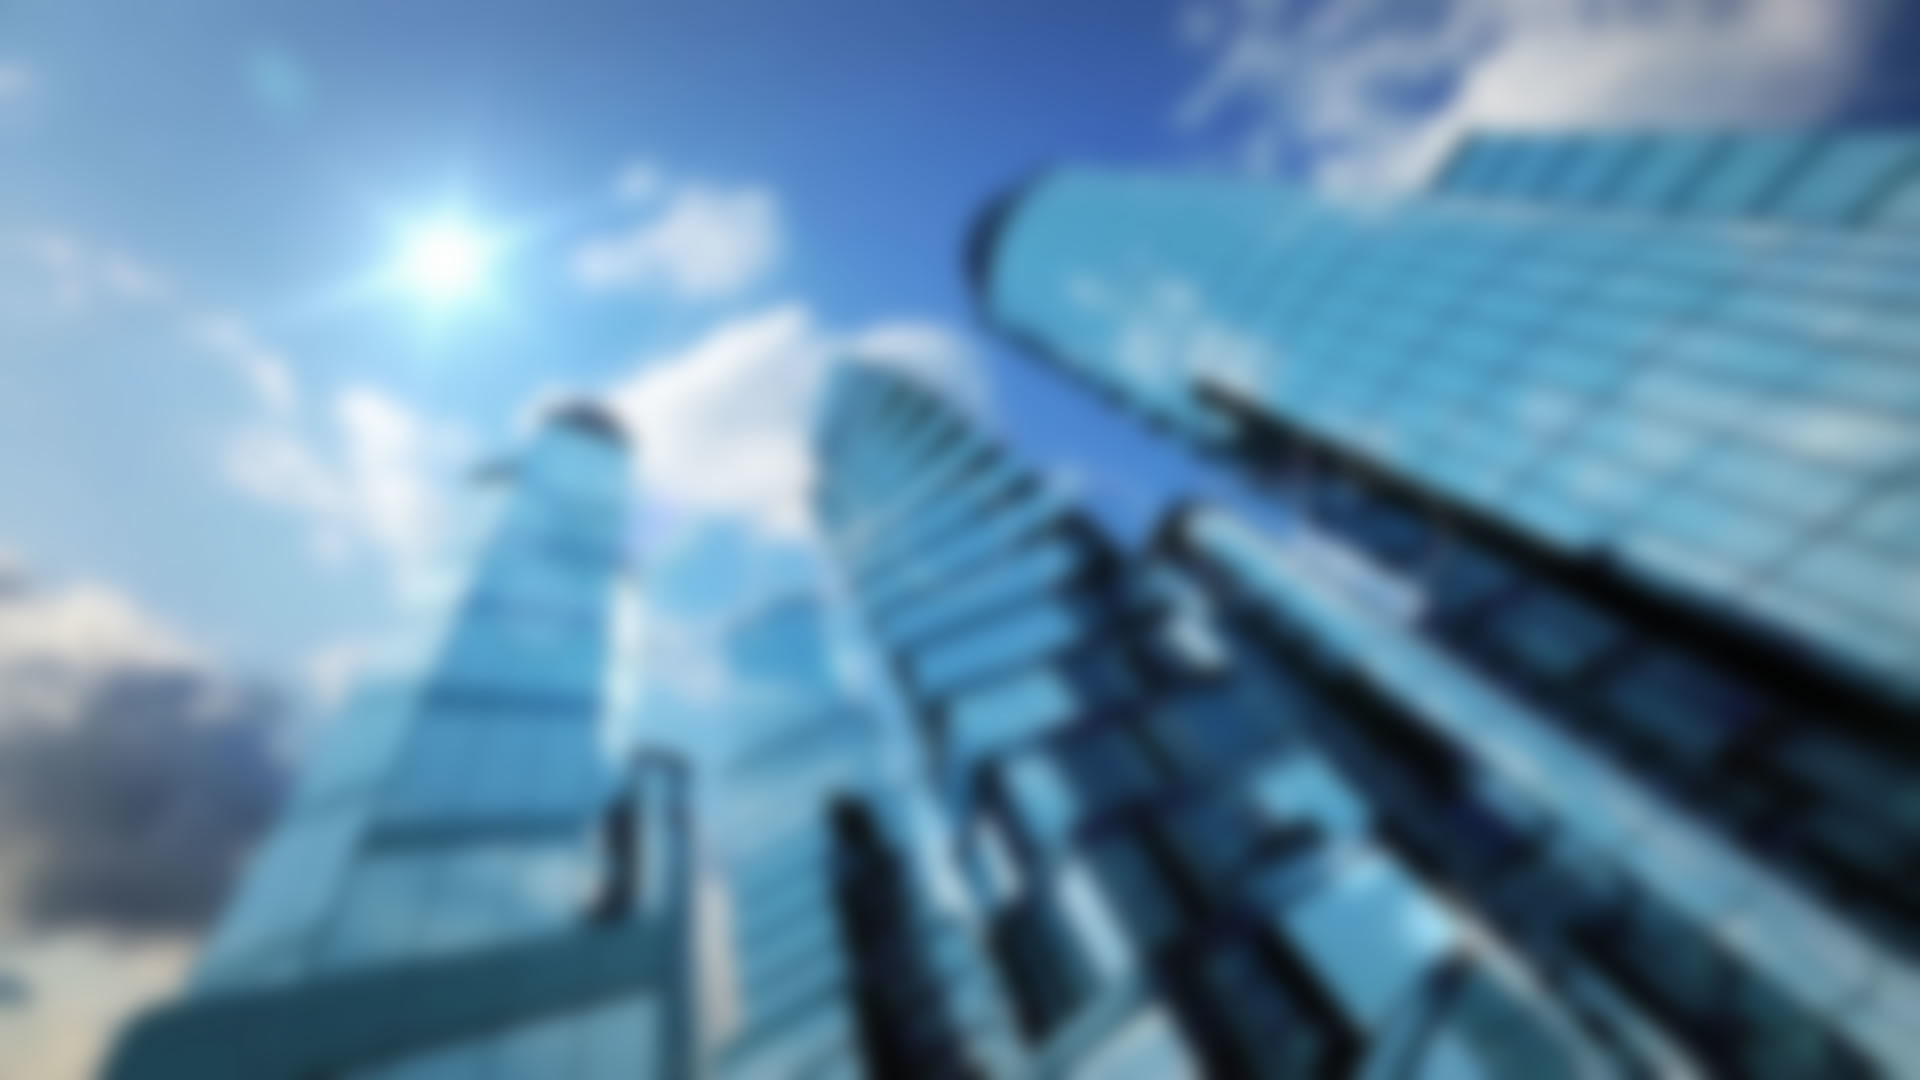 business 1400×425 jpg linkedin wallpaper – photo #9